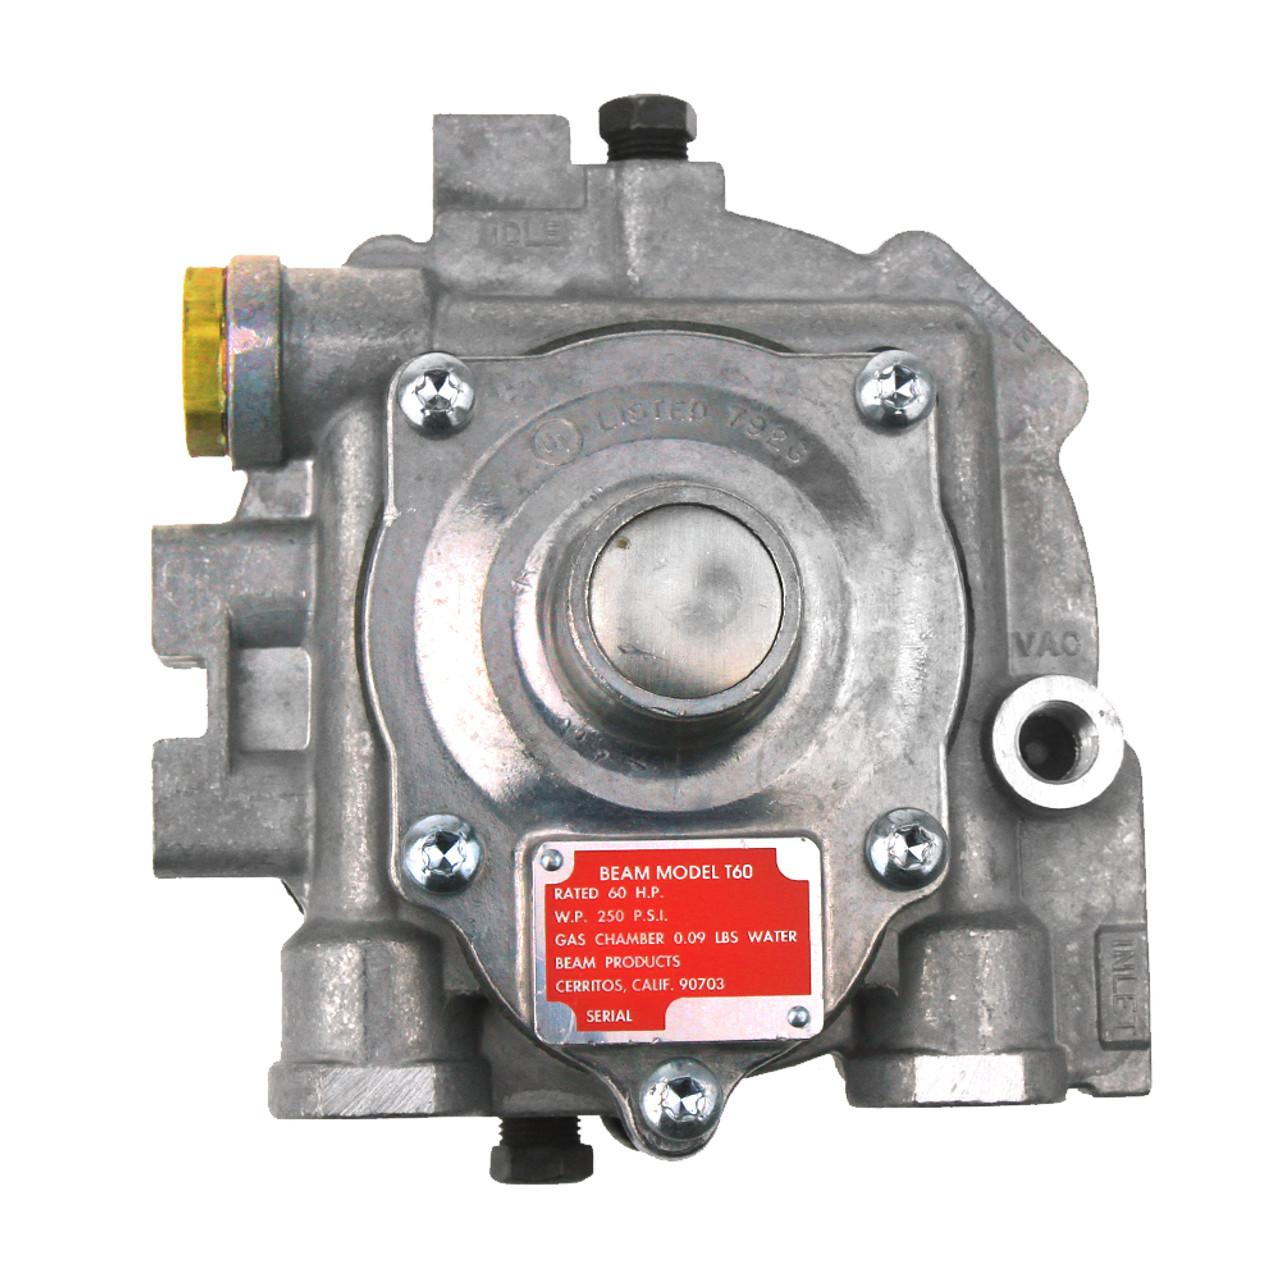 medium resolution of impco beam model t60 60 hp gas chamber propane forklift gas regulator